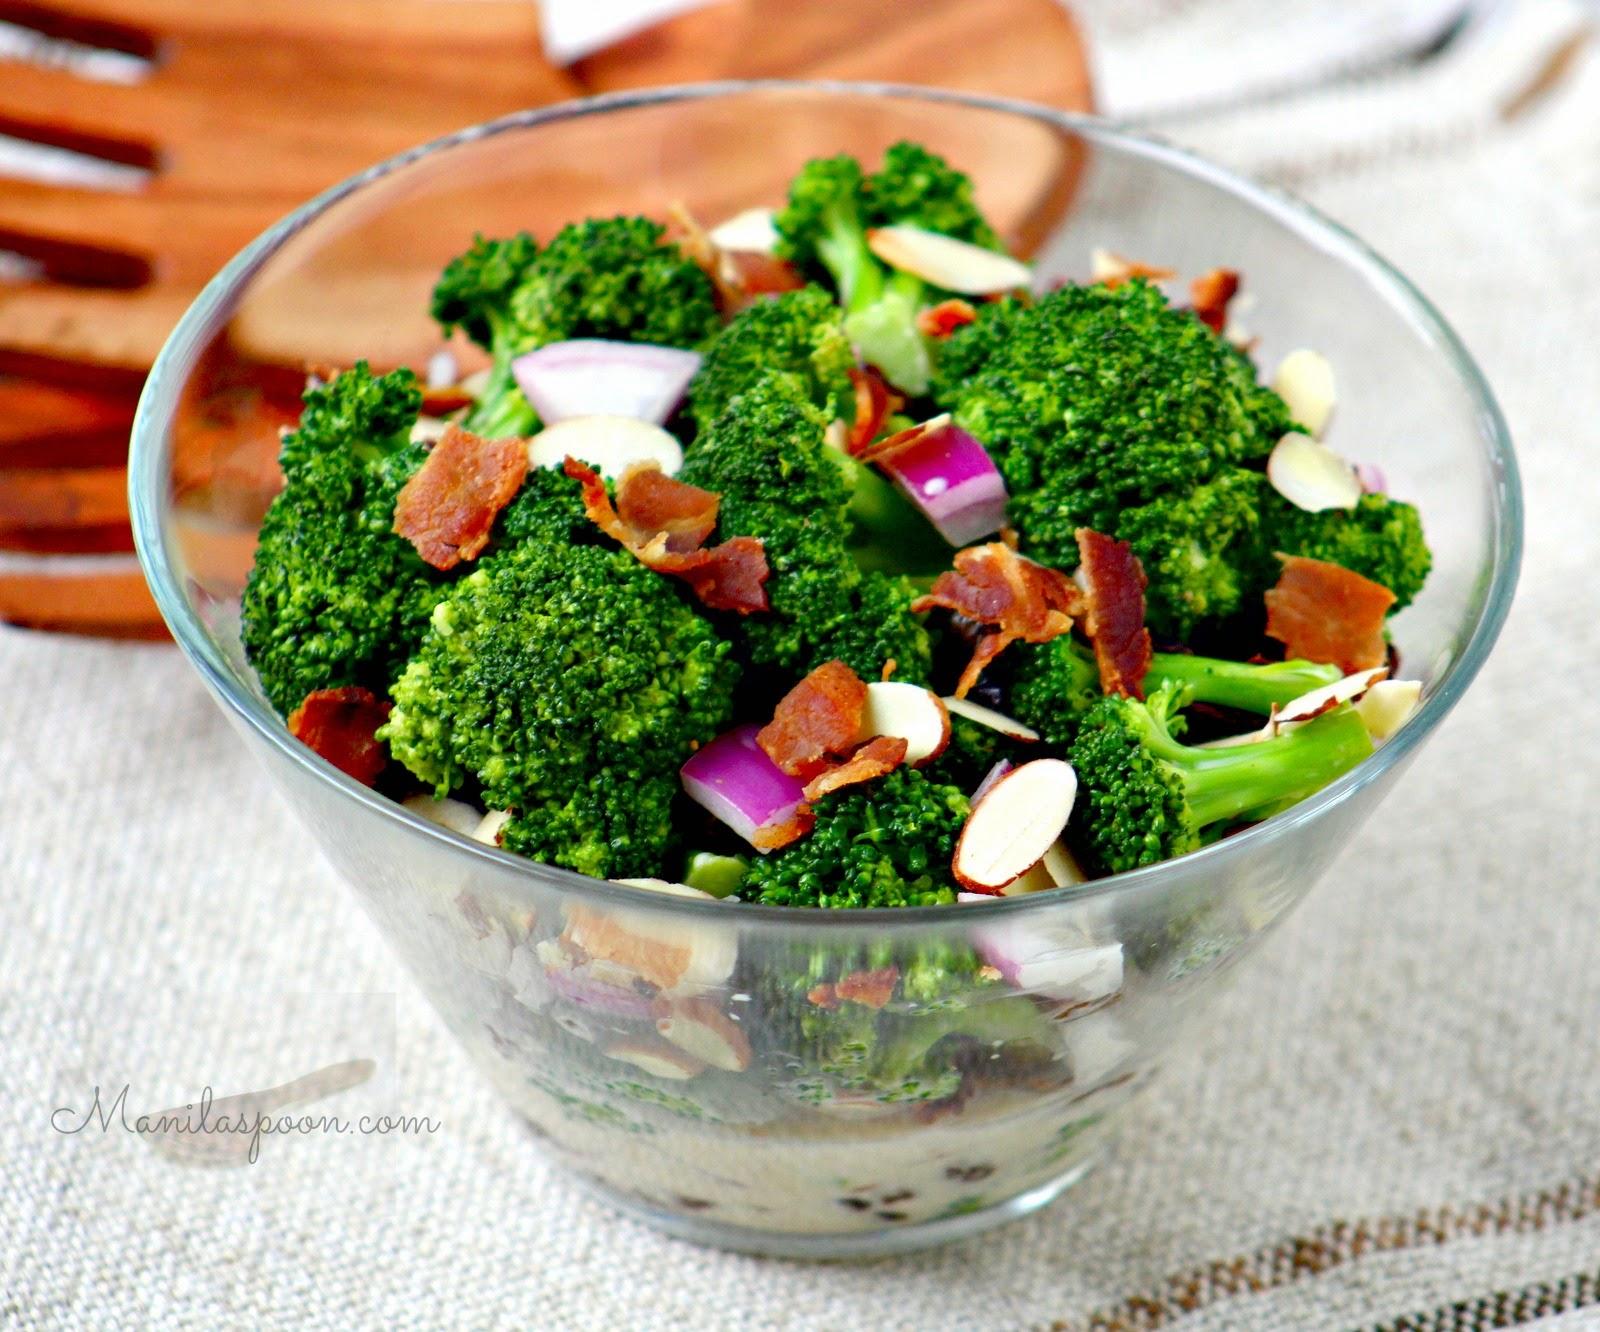 Broccoli Bacon Salad with Raisins and Almonds